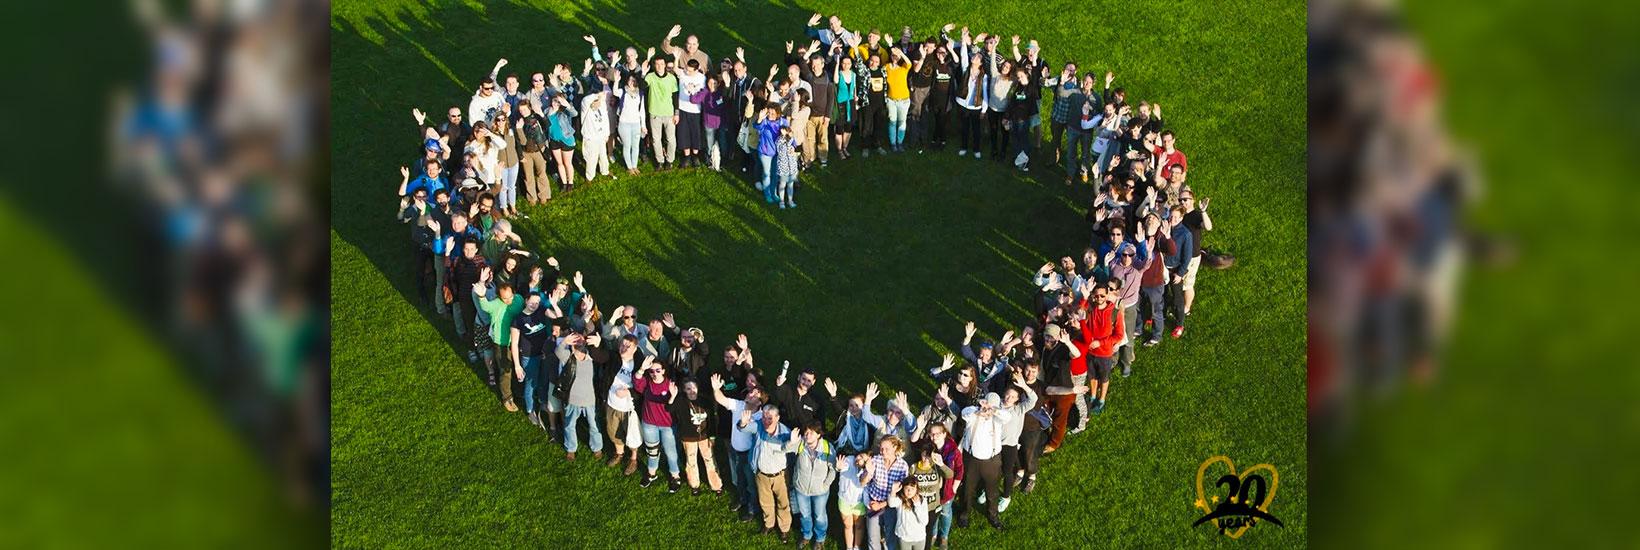 ALDA: 20 years of Local Democracy